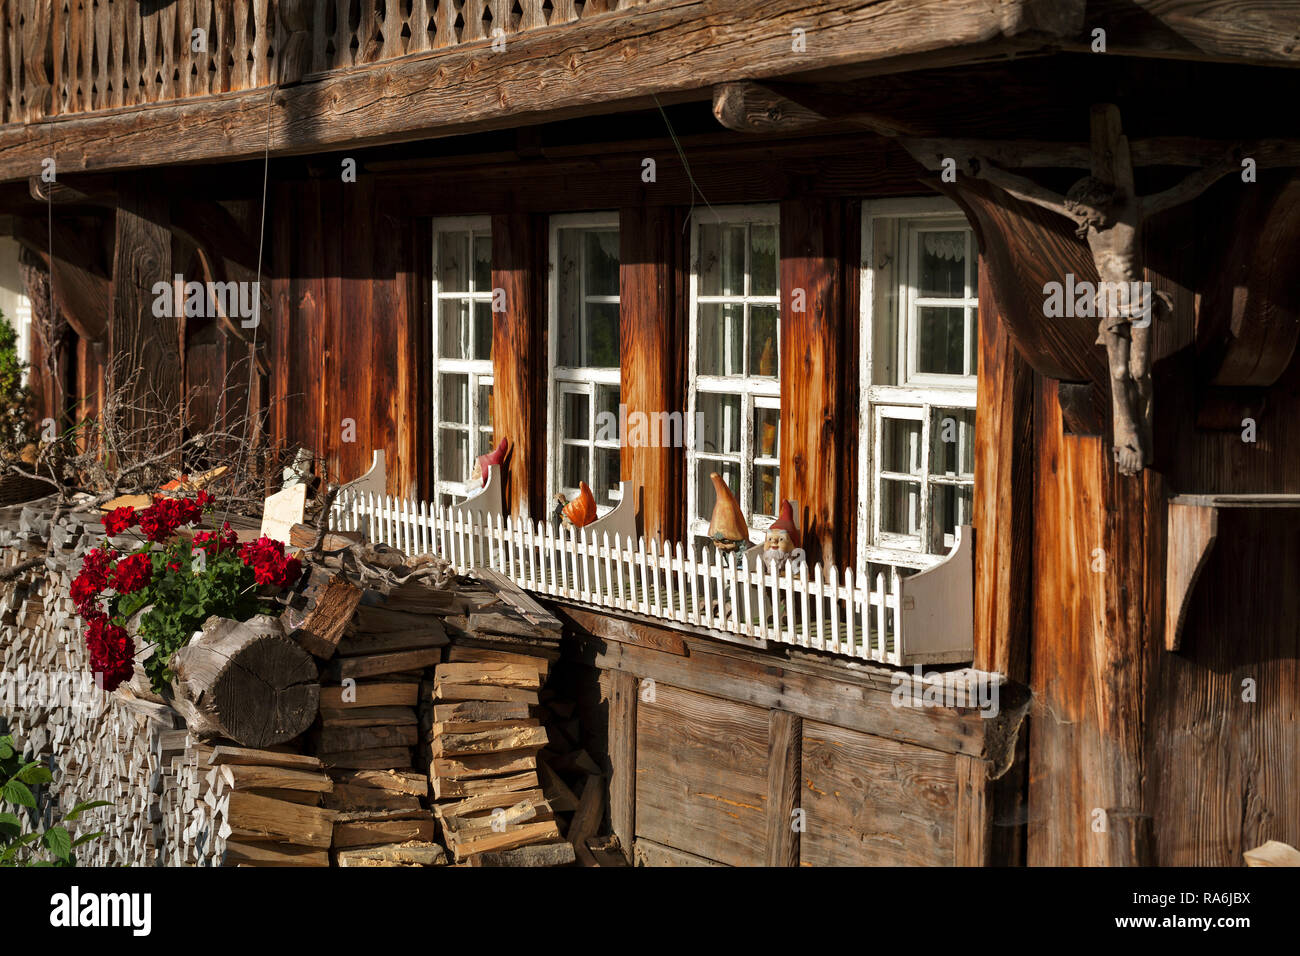 Casa de granja en Geschwend en la Selva Negra. Foto de stock